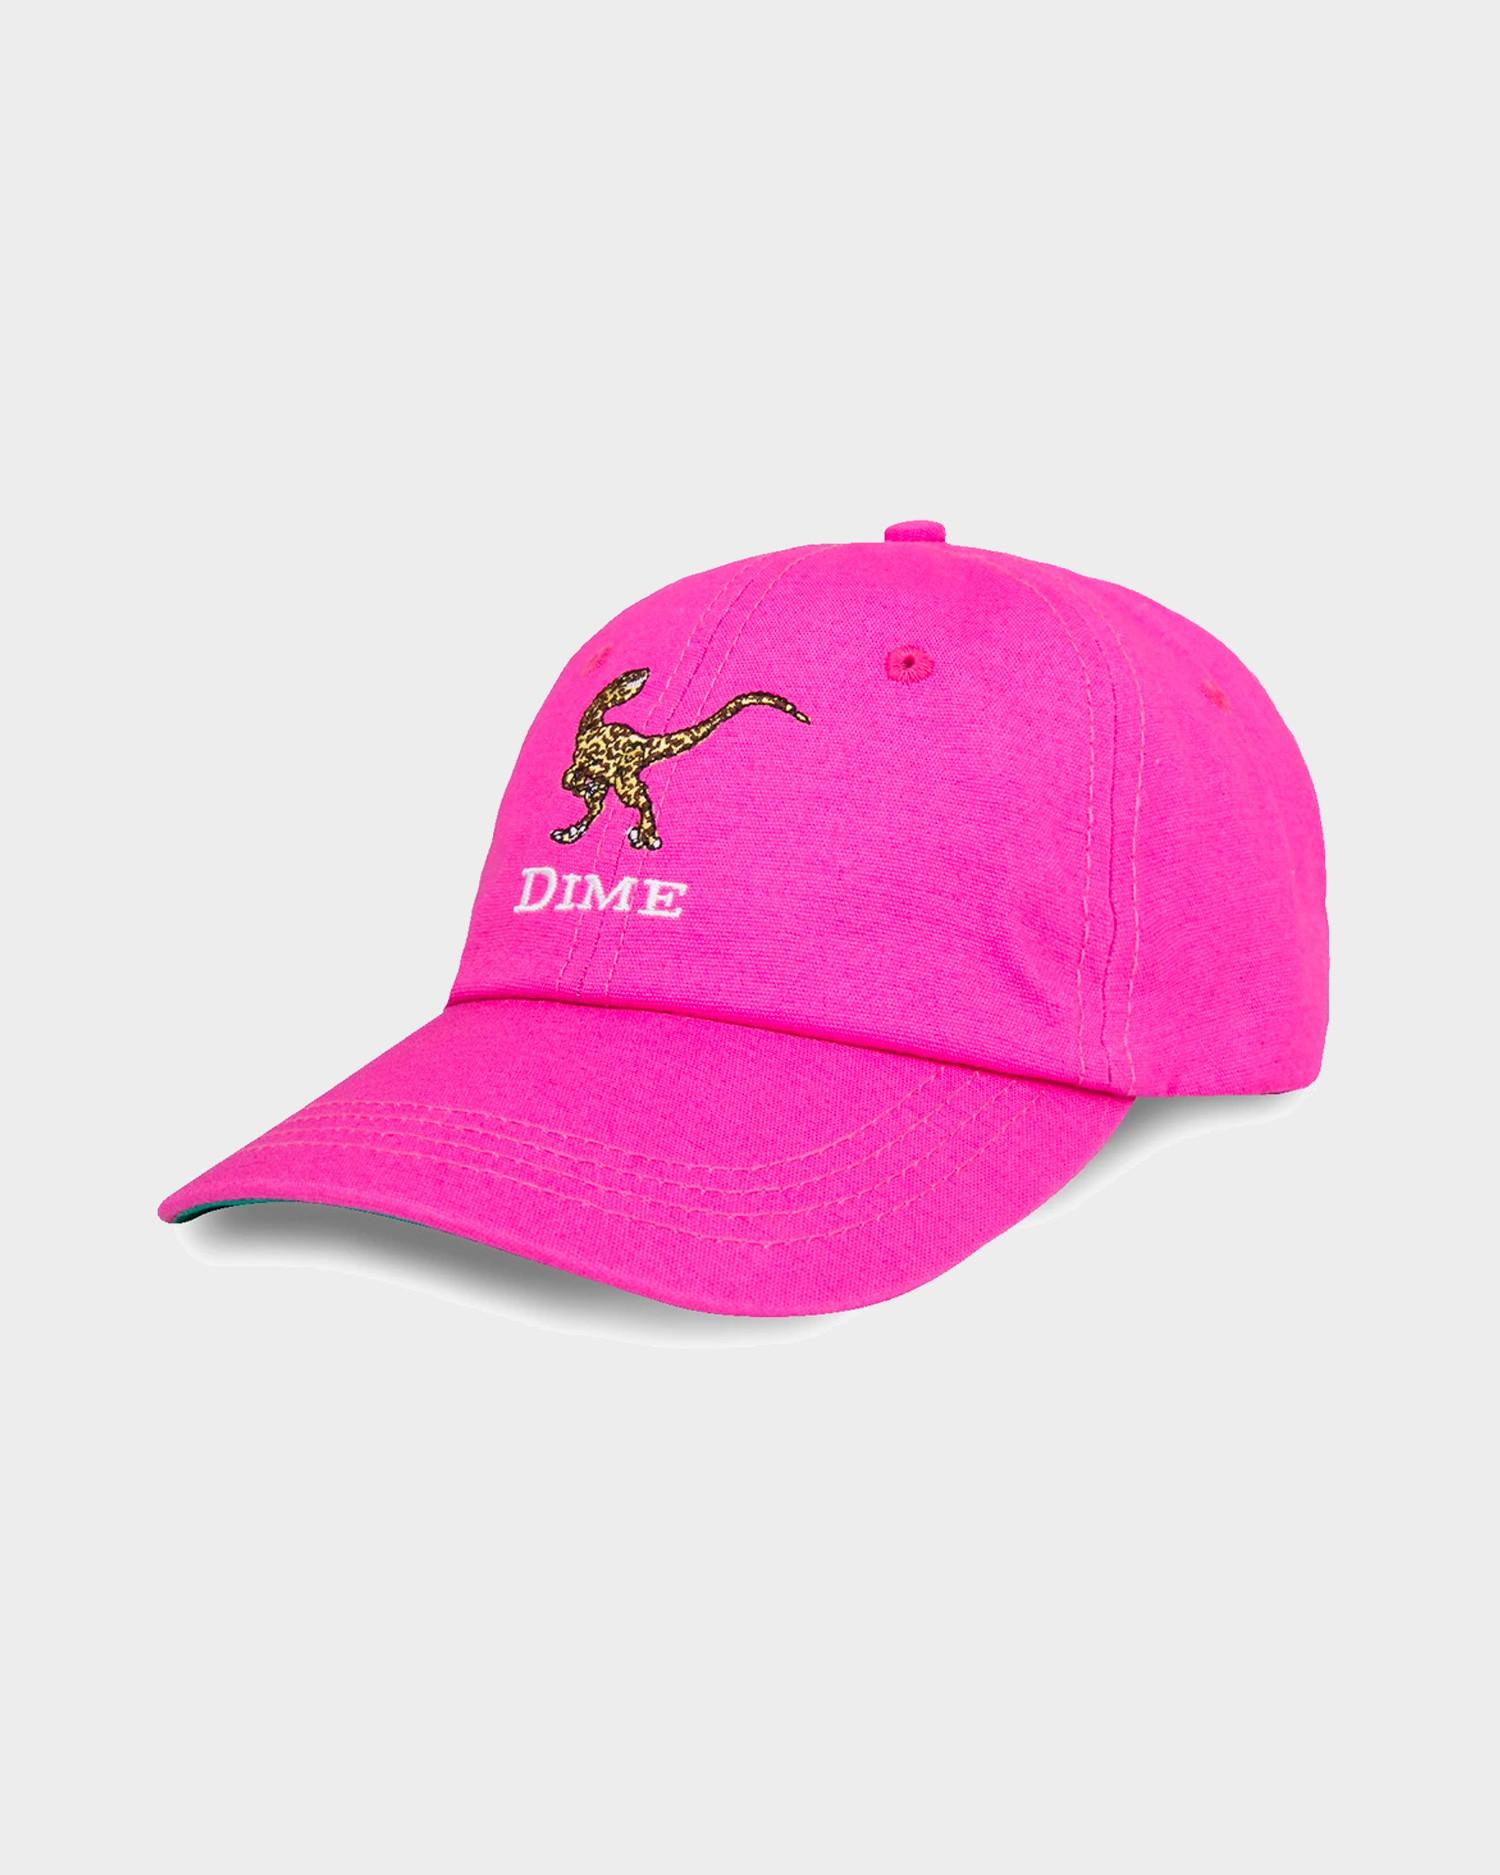 Dime Leopardino Cap Pink